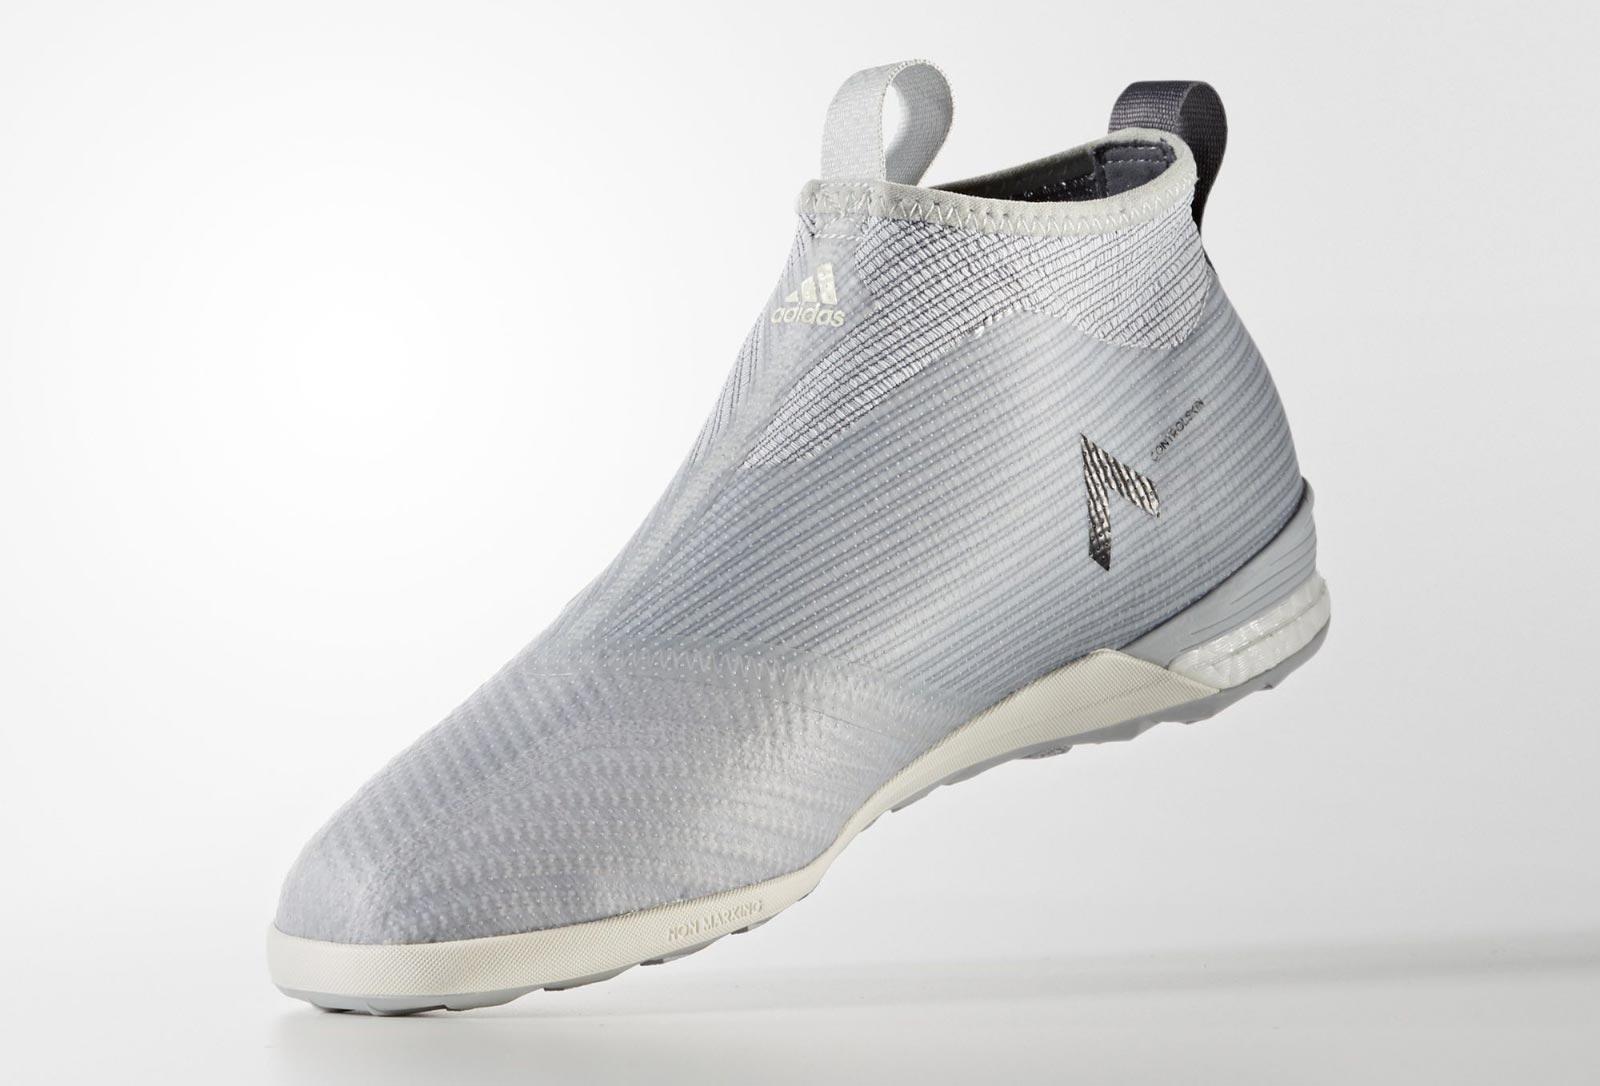 adidas ace tango 17 purecontrol dust storm indoor boots. Black Bedroom Furniture Sets. Home Design Ideas